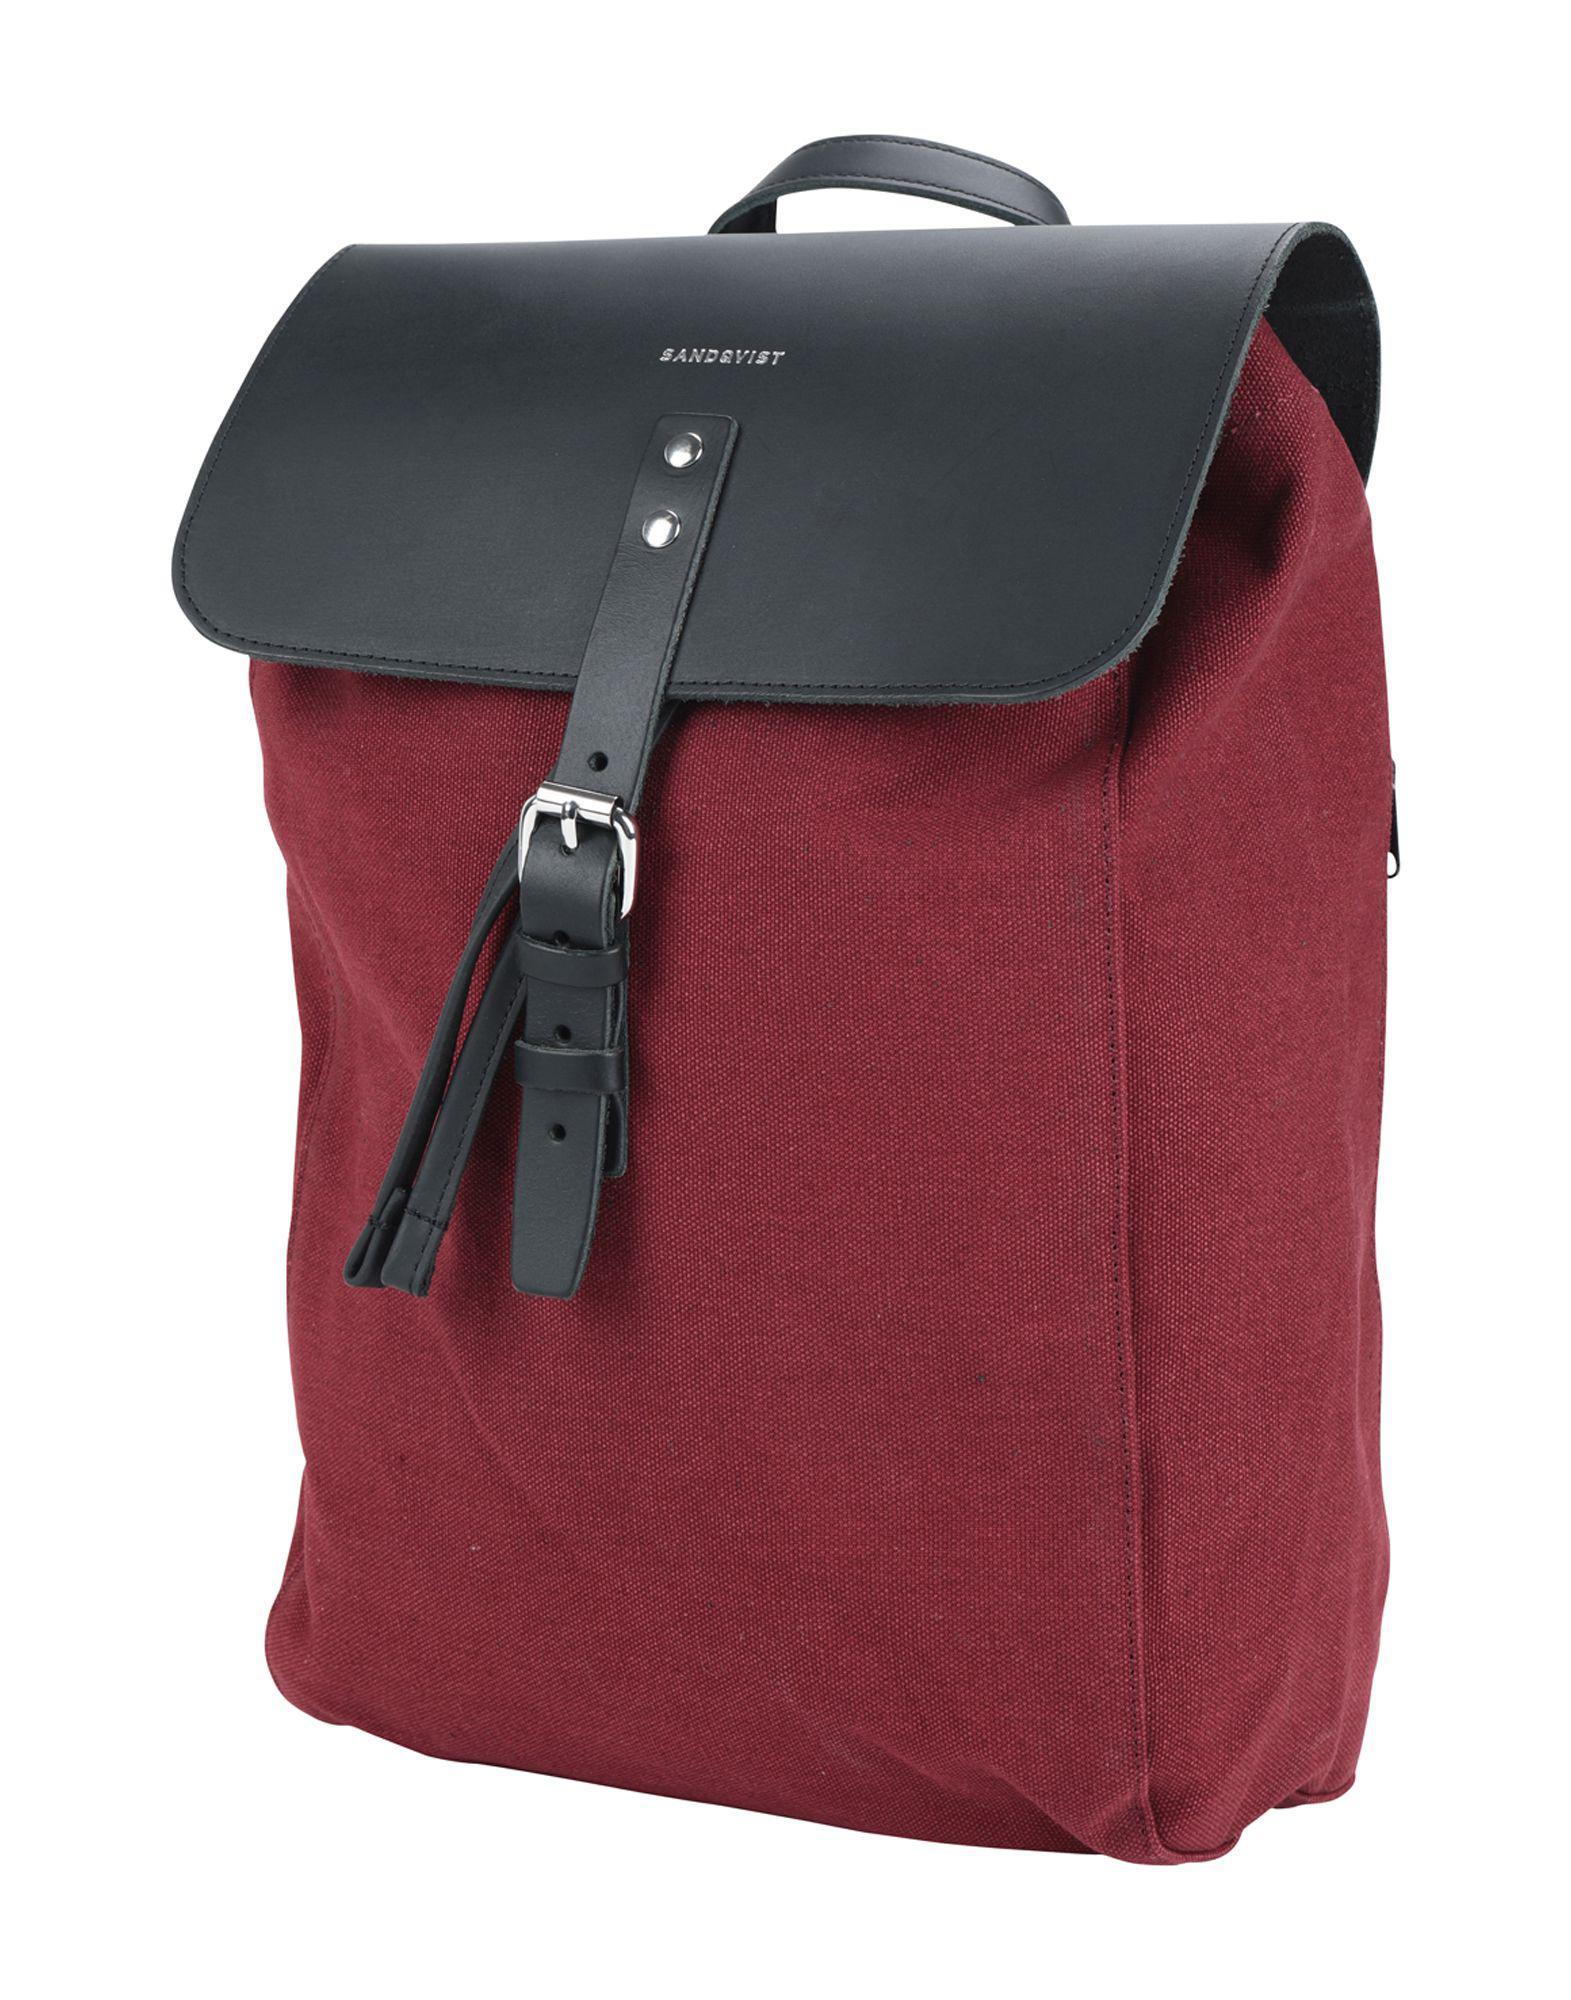 Sandqvist Bags Lyst Backpacks Bum amp; qvUwpqY